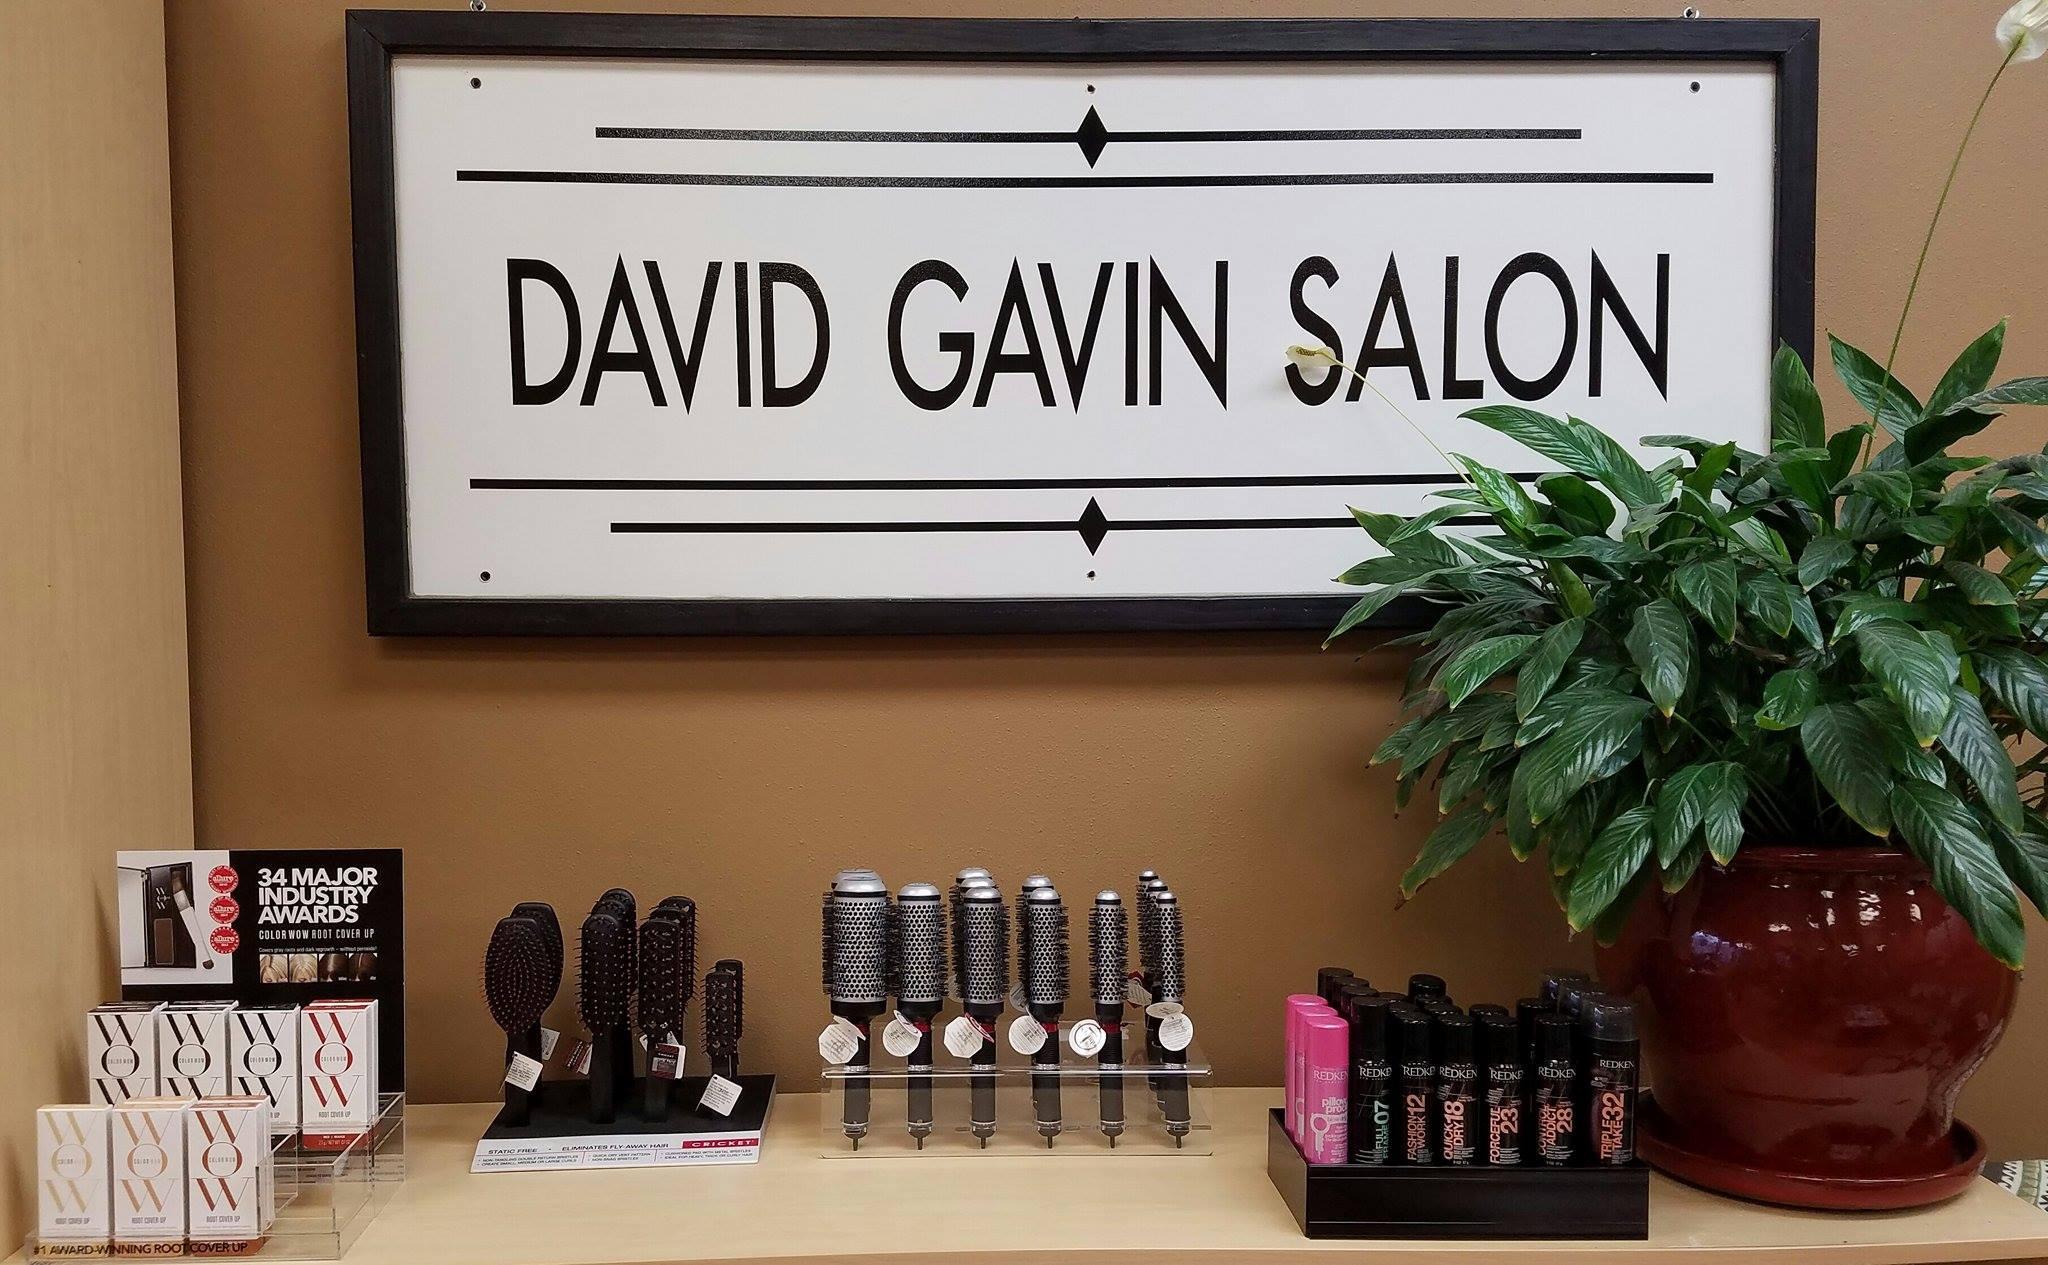 David Gavin Salon of the Berkshires